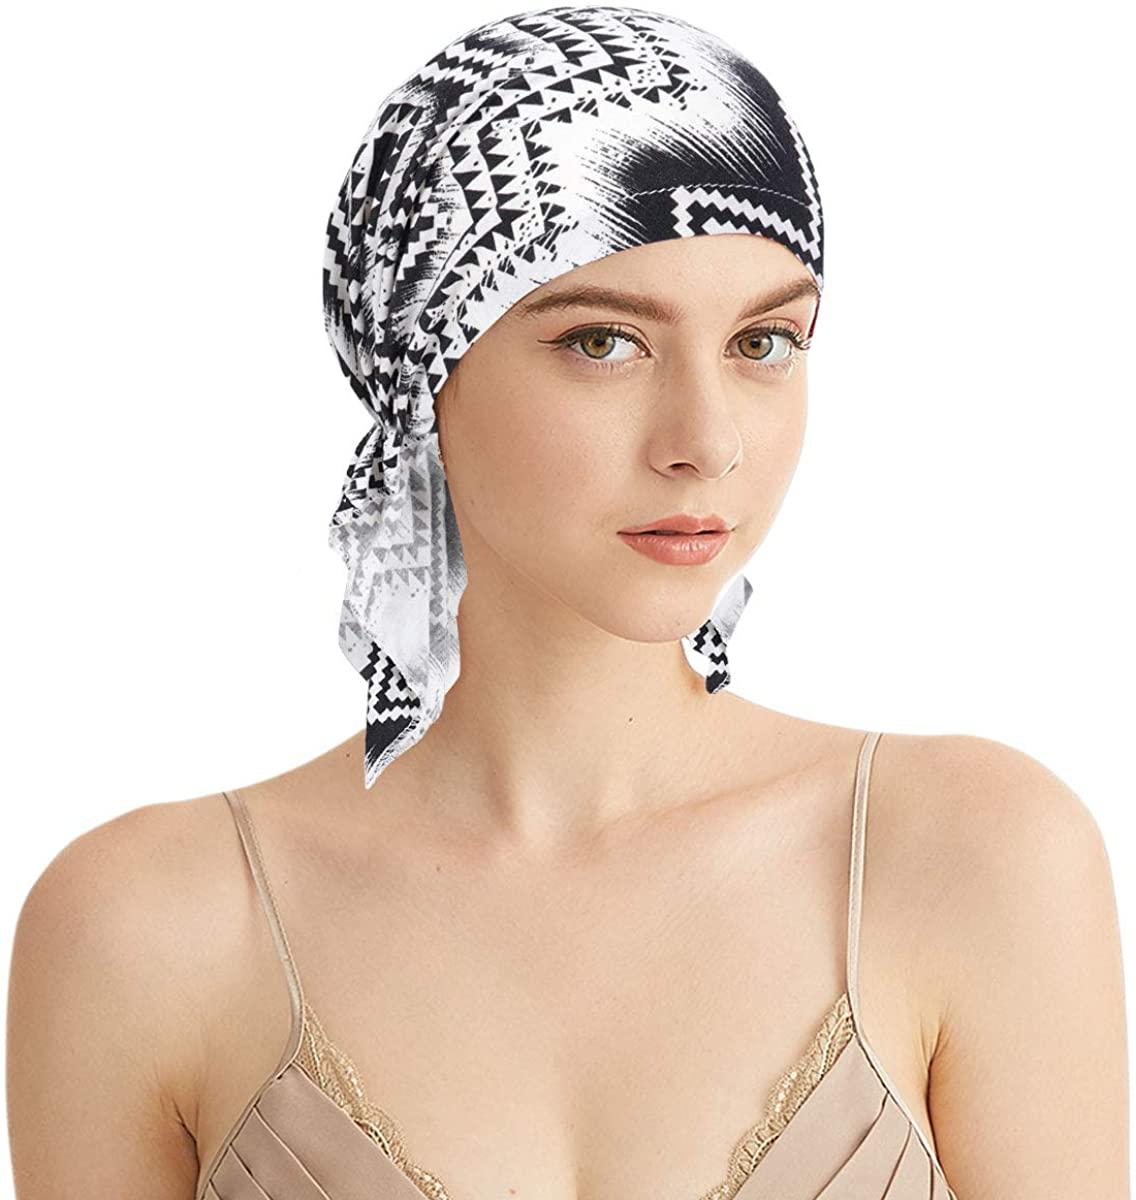 Chemo Head Scarf - Bandana Beanie Cap Pre Tie Skull Cover Cap Chemo Headwear Scarves for Cancer Hair Loss